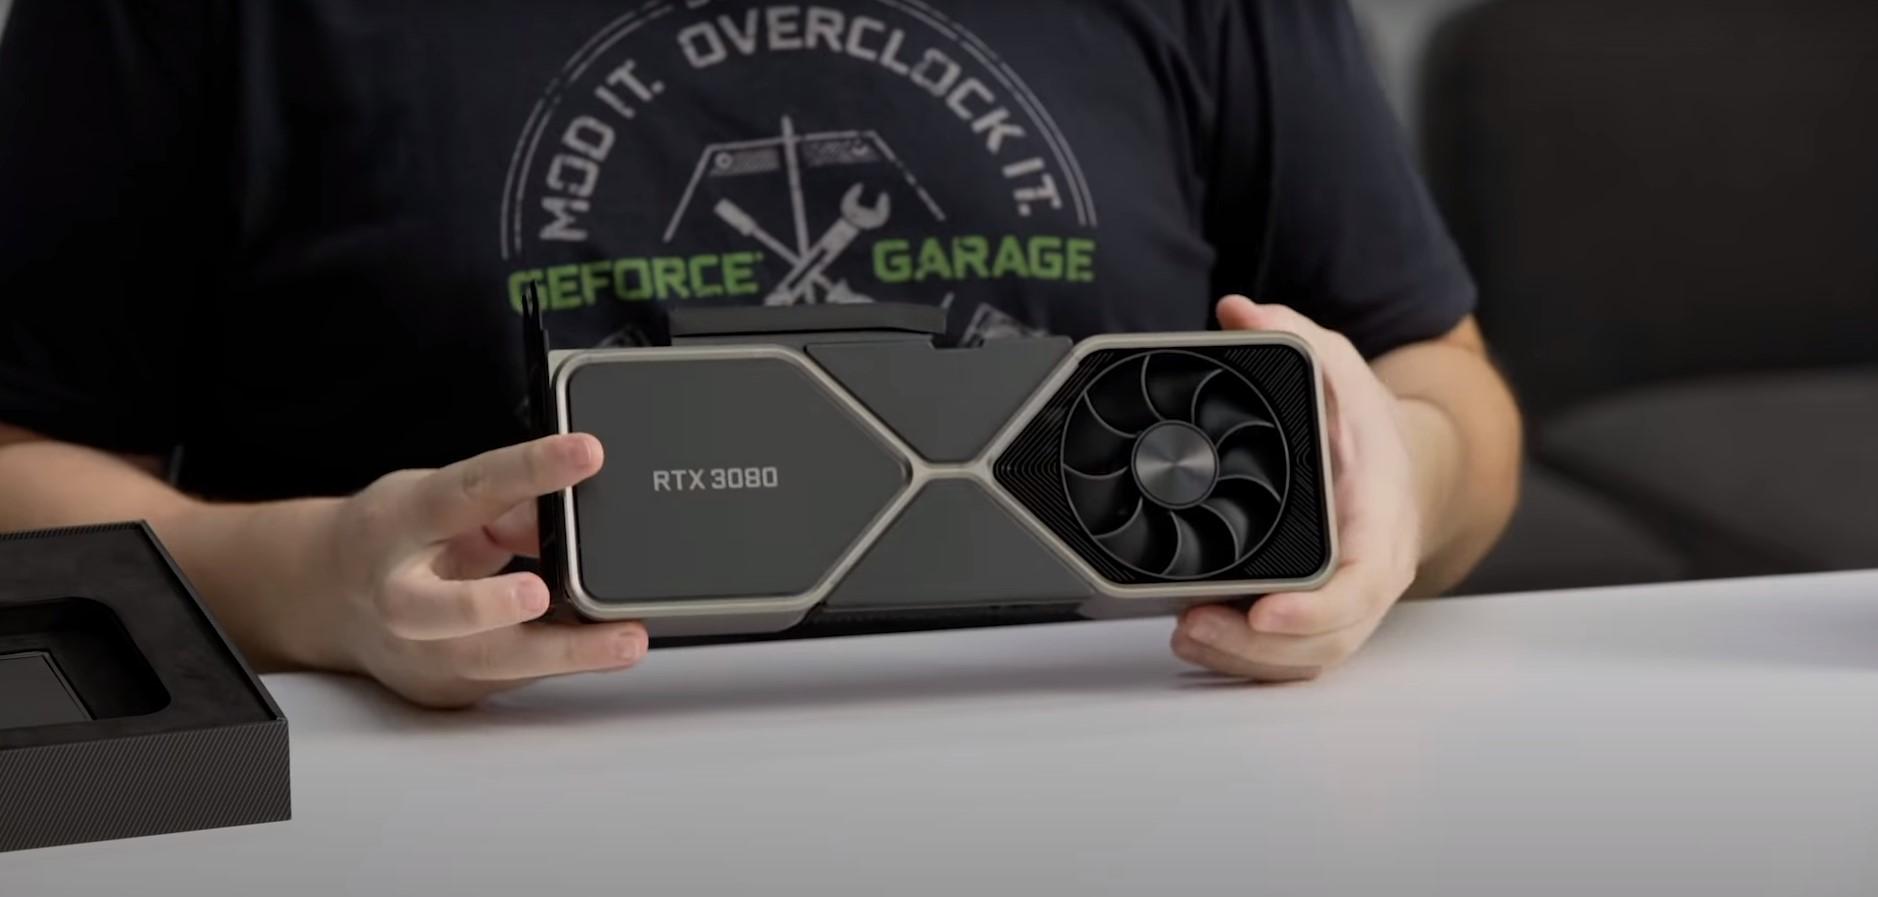 NVIDIA GeForce RTX 3080 Founders Edition 背面外觀。